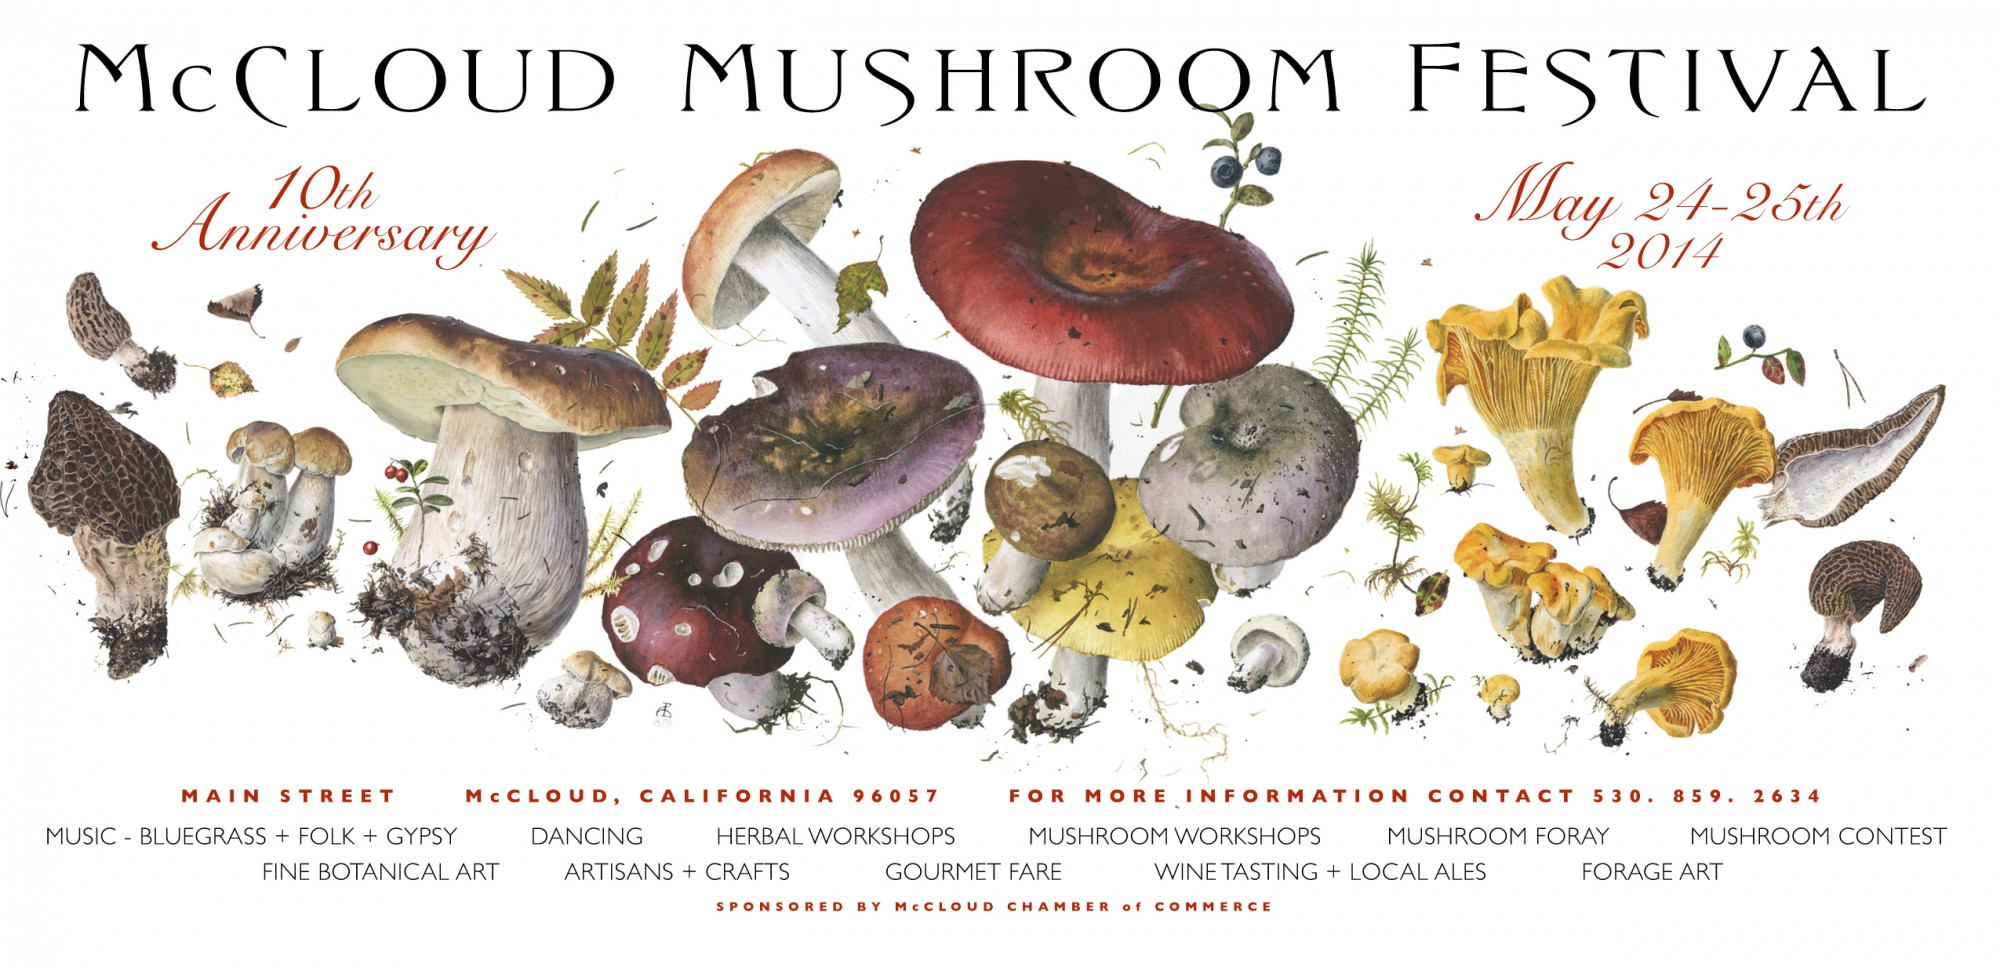 First Festival of the Year - Mushroom Fair - May 24 & 25